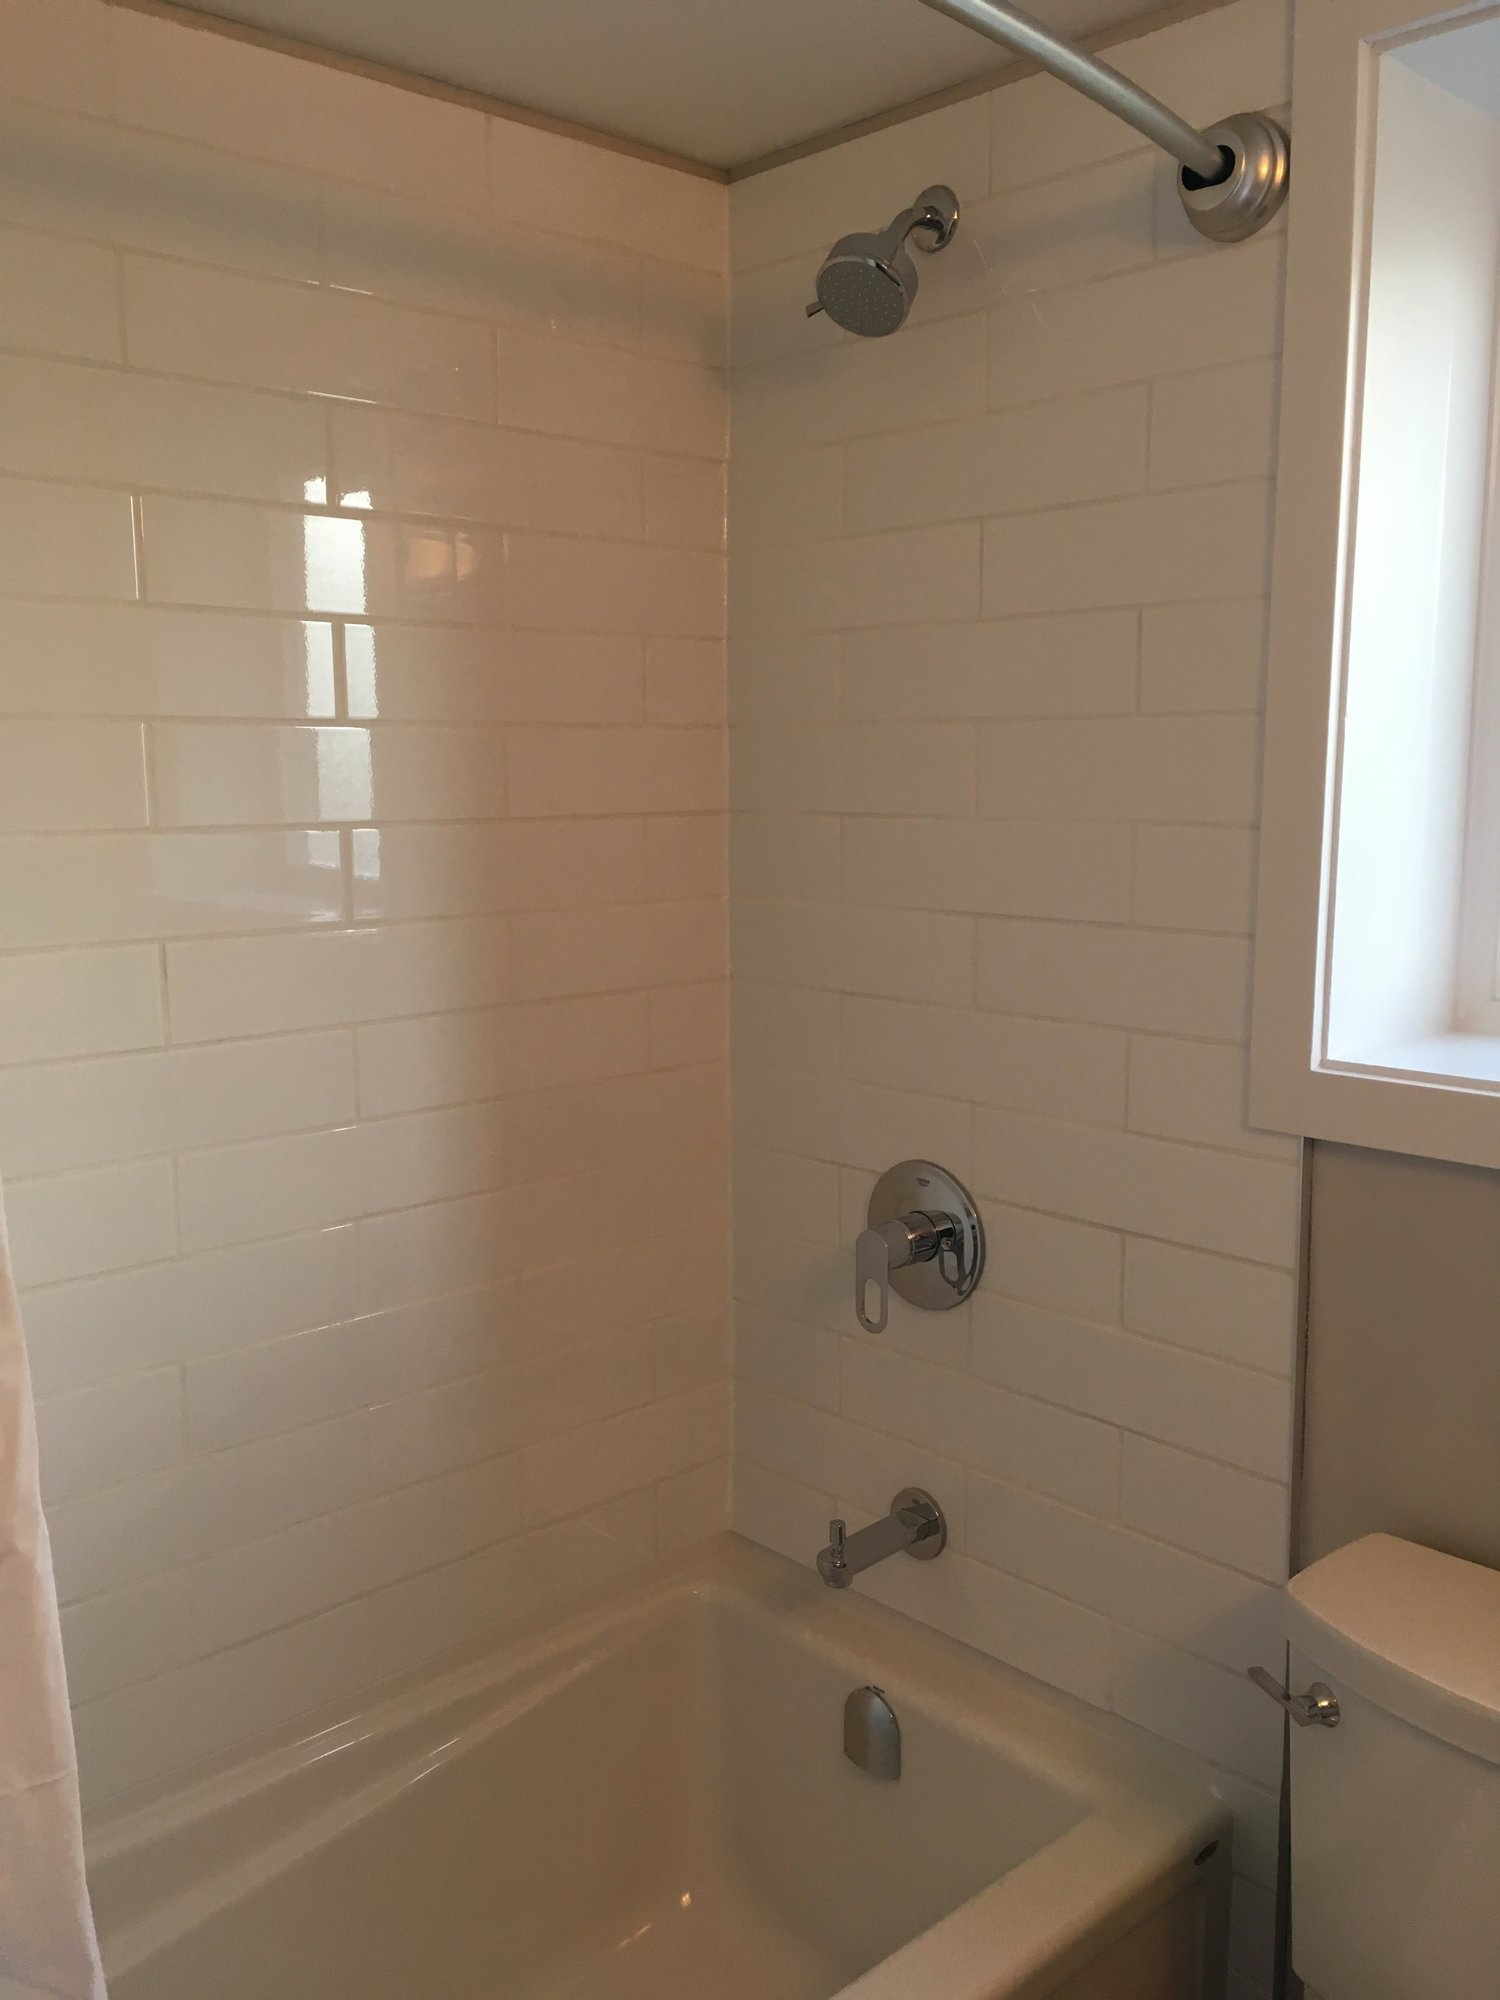 Bathrooms — Create Design & Construction